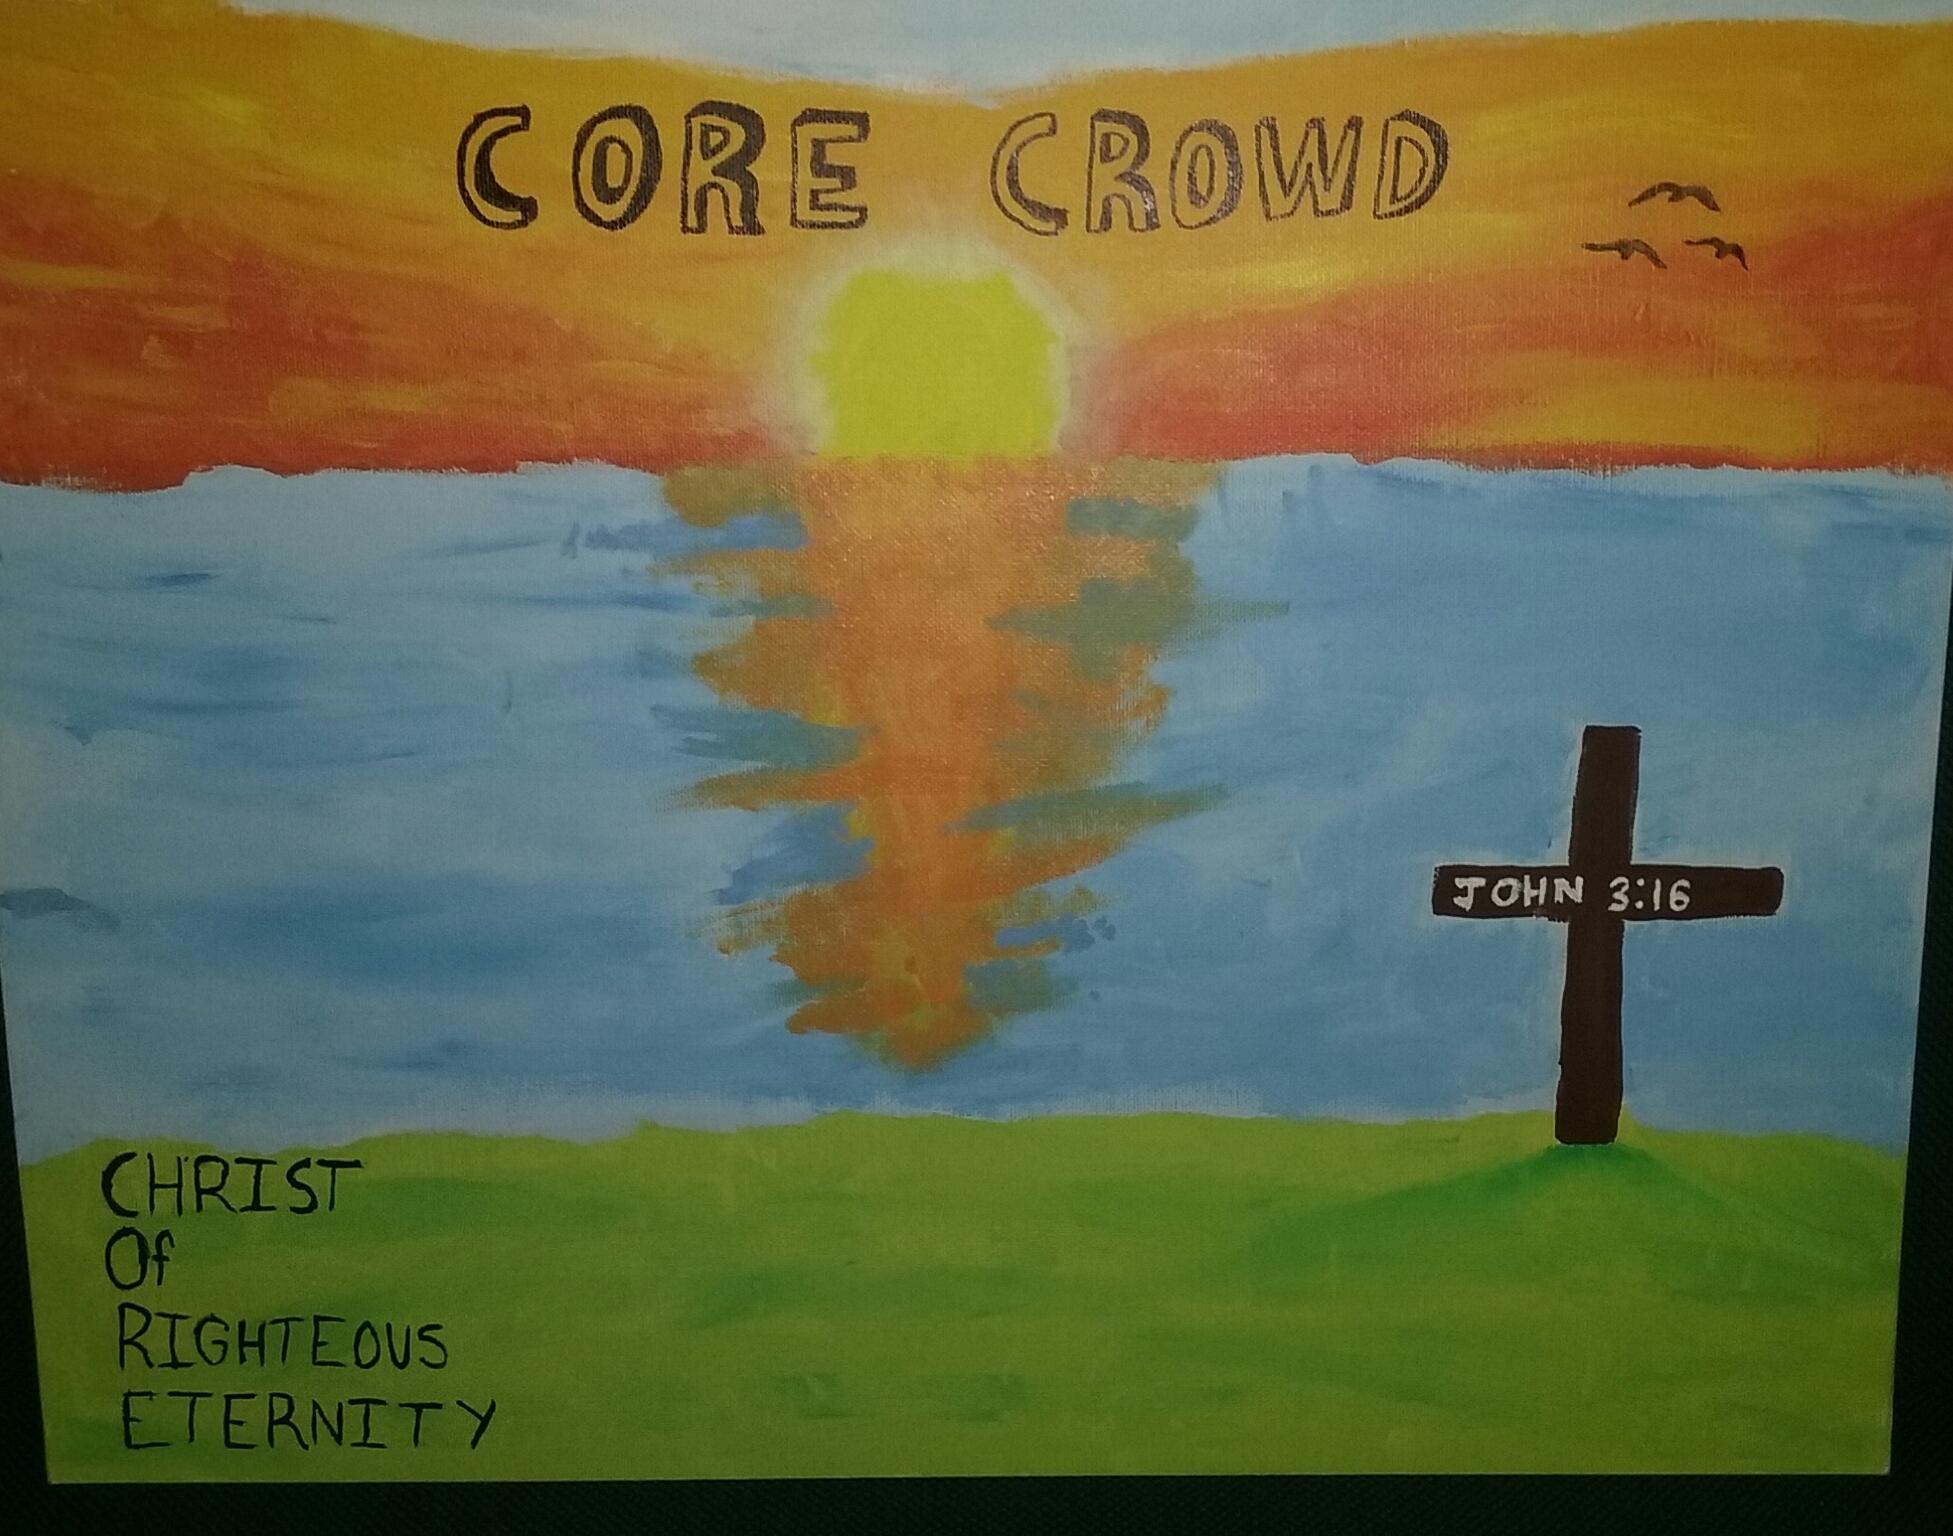 CORE Crowd